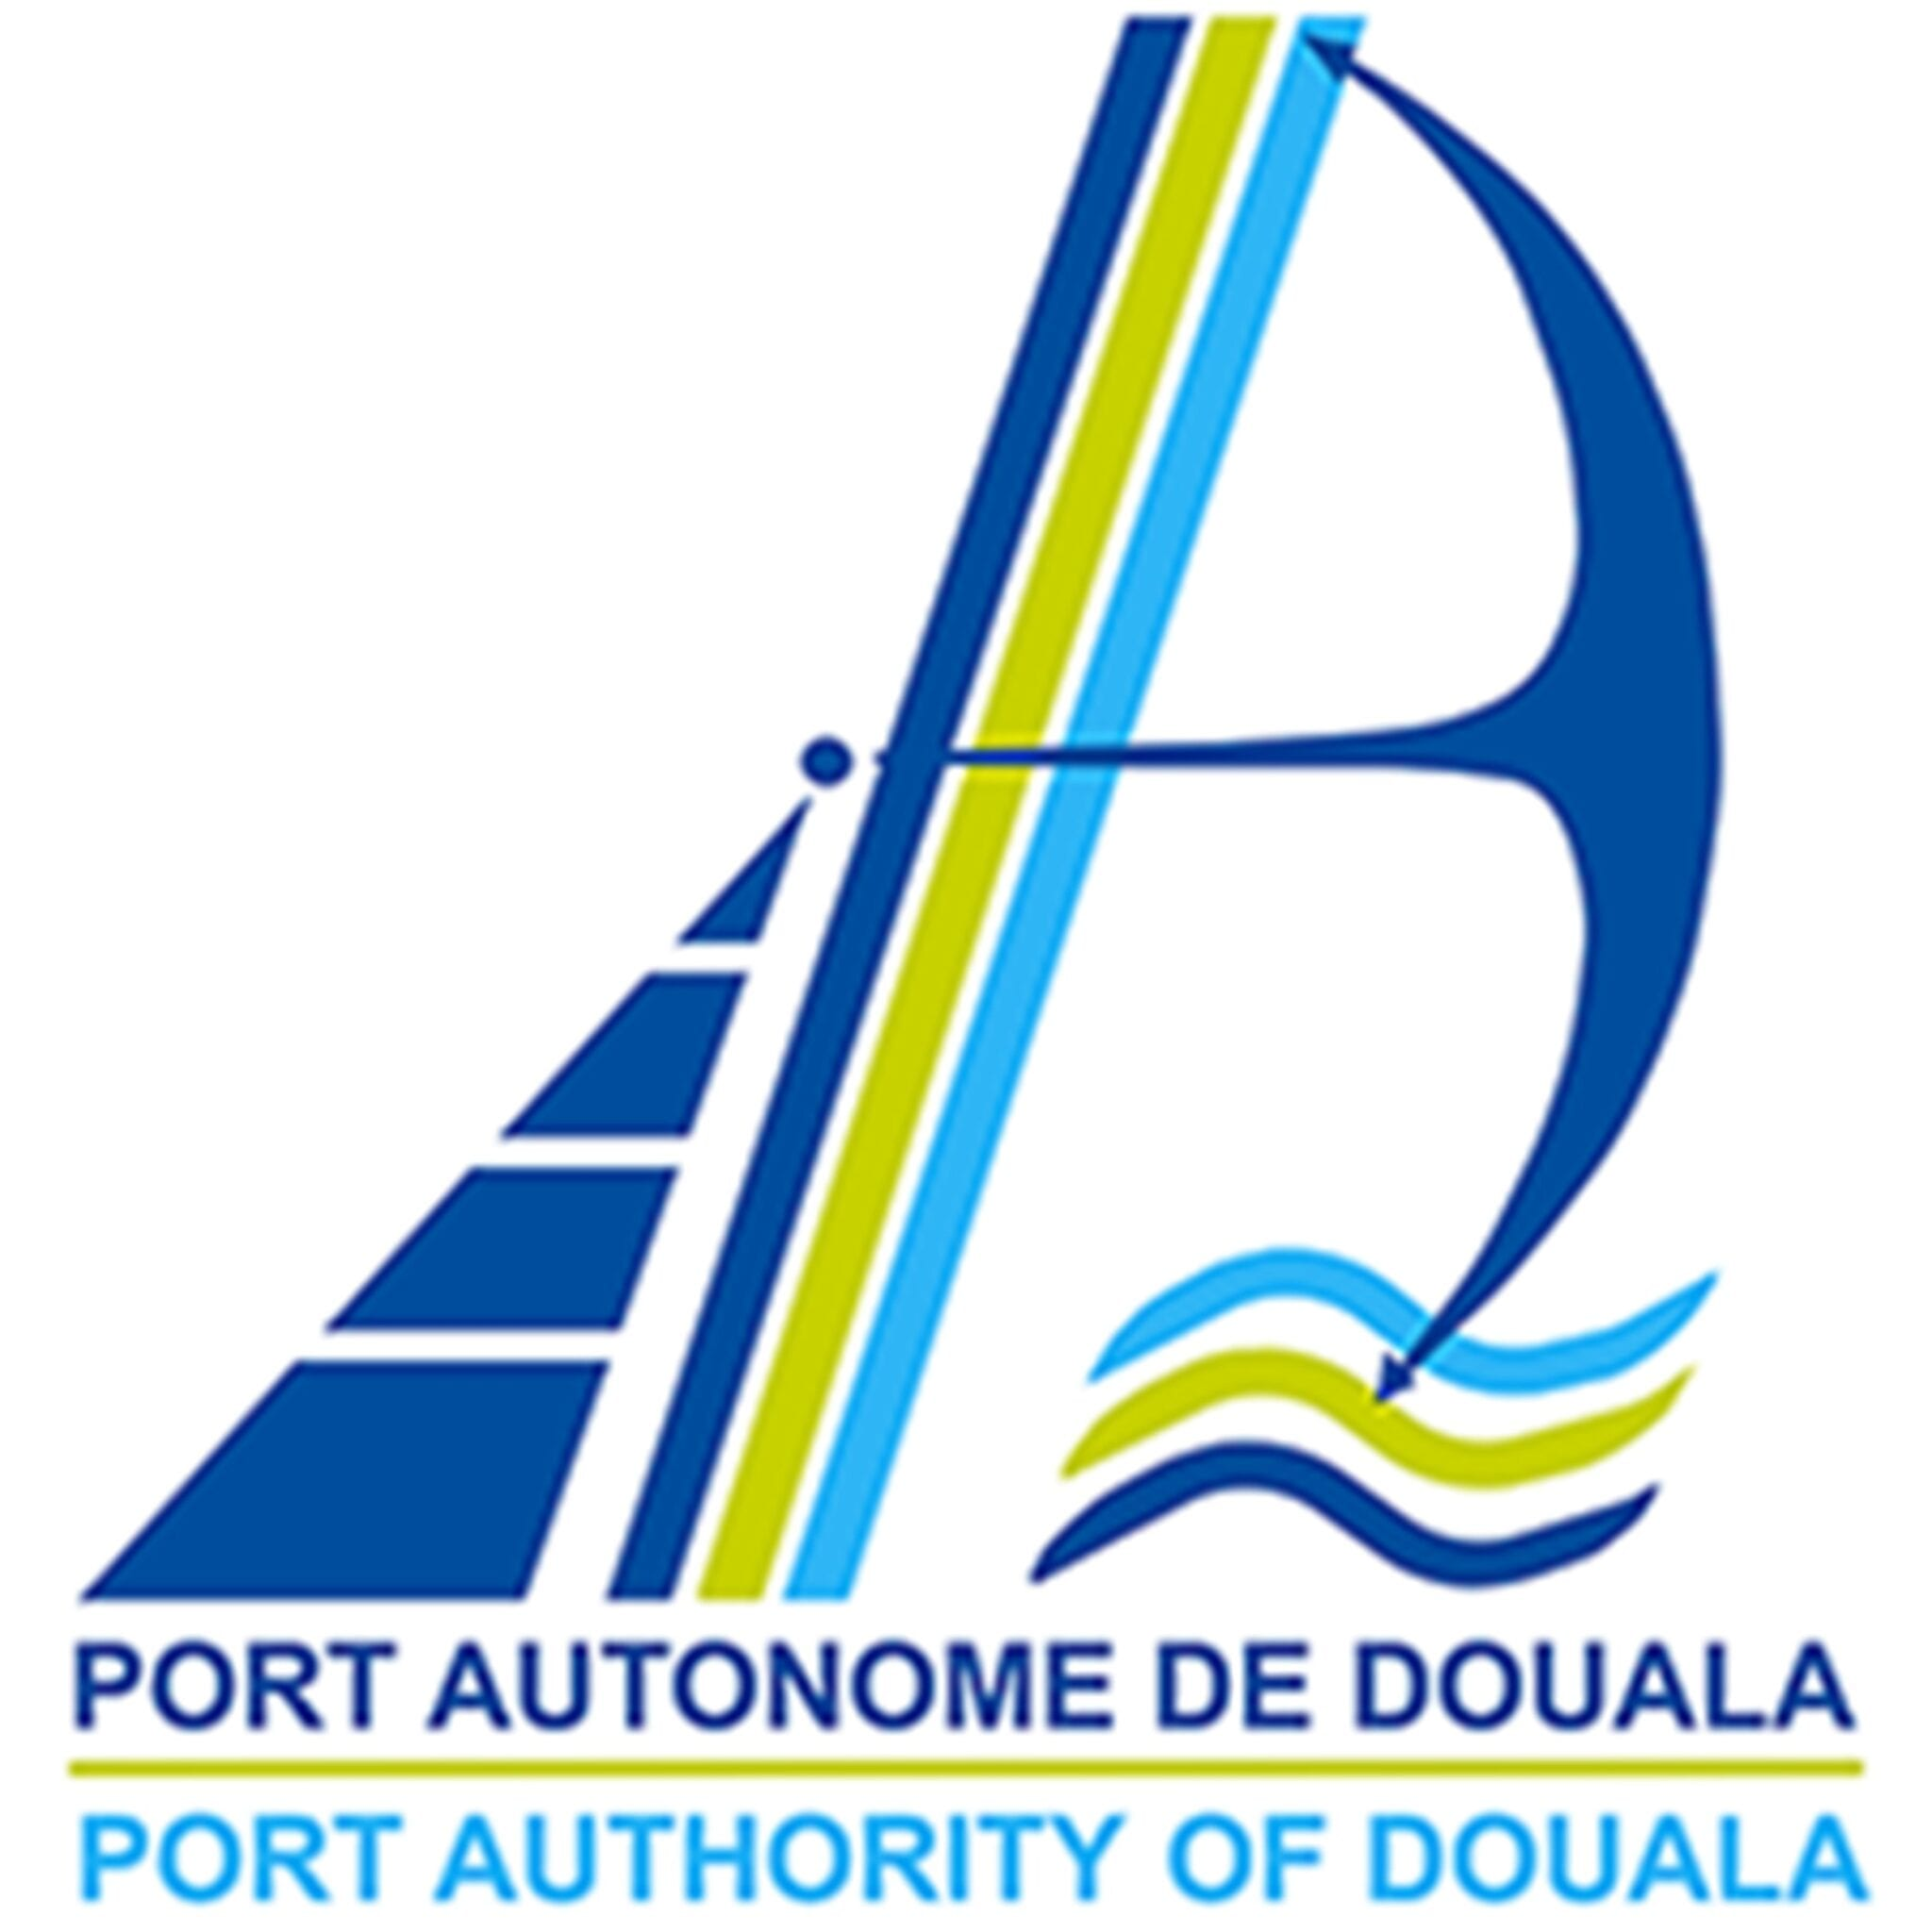 Le Port Autonome de Douala Recrute